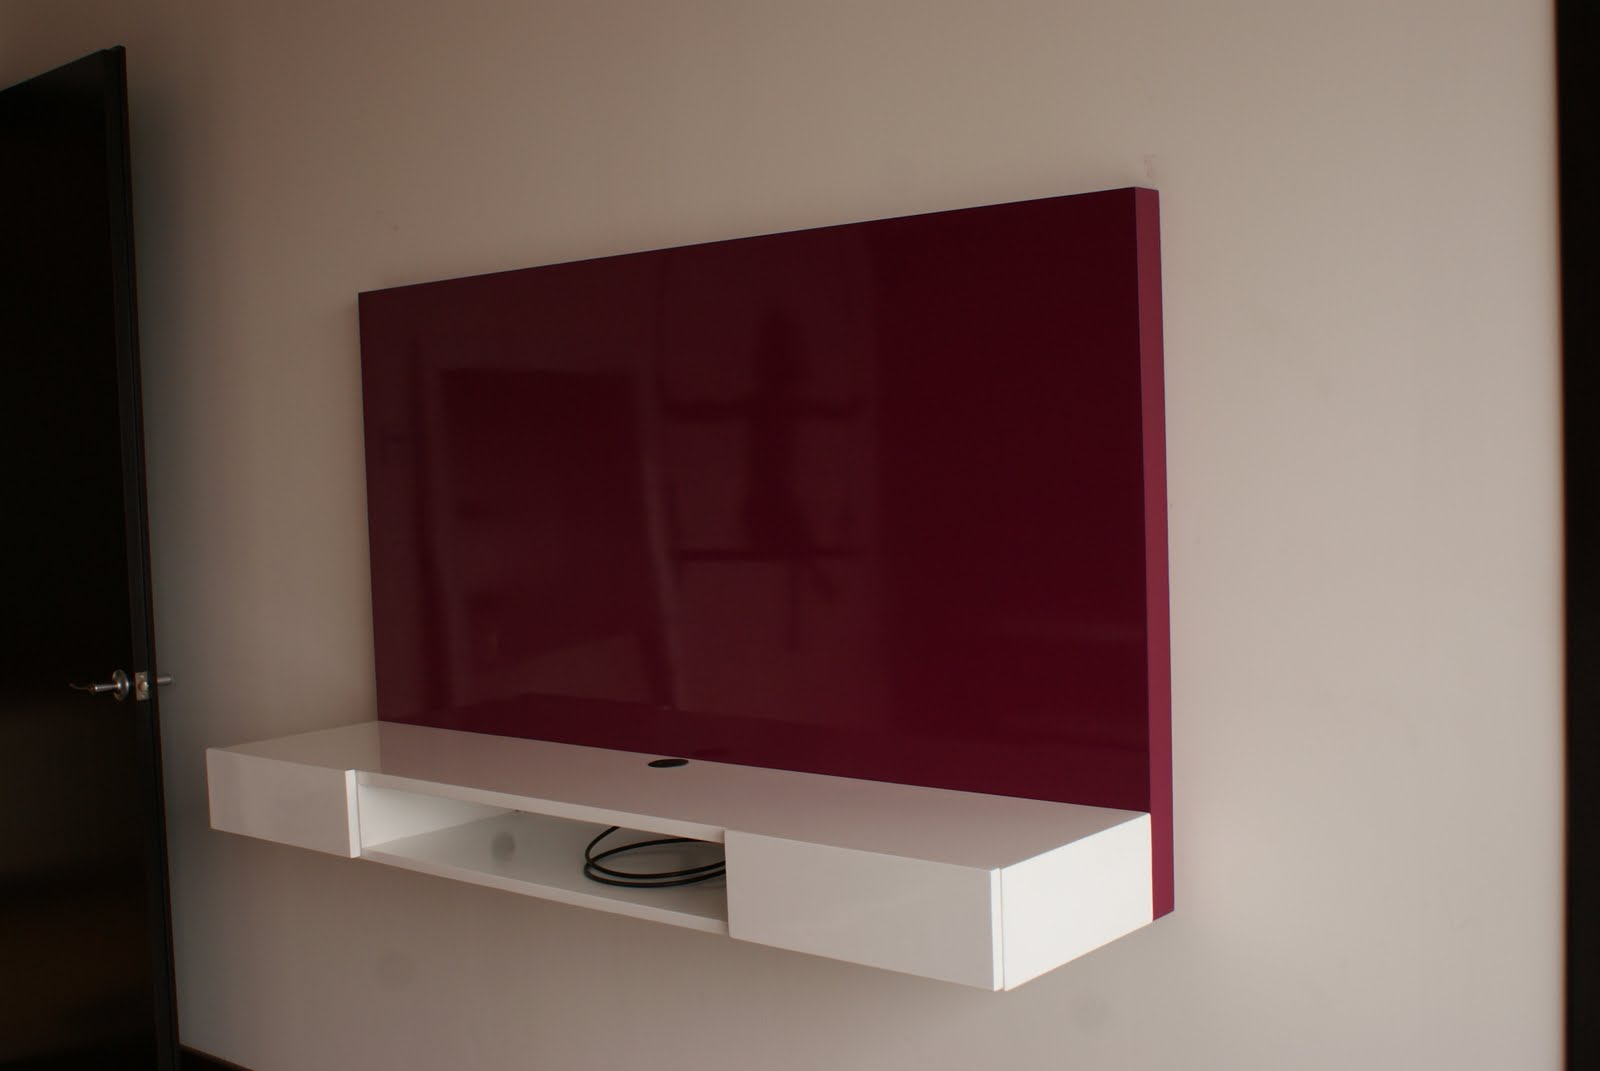 Mueble Tv Pared Elemento De Pared Tv Colored Horizontal O  # Mueble Soporte Tv Diseno